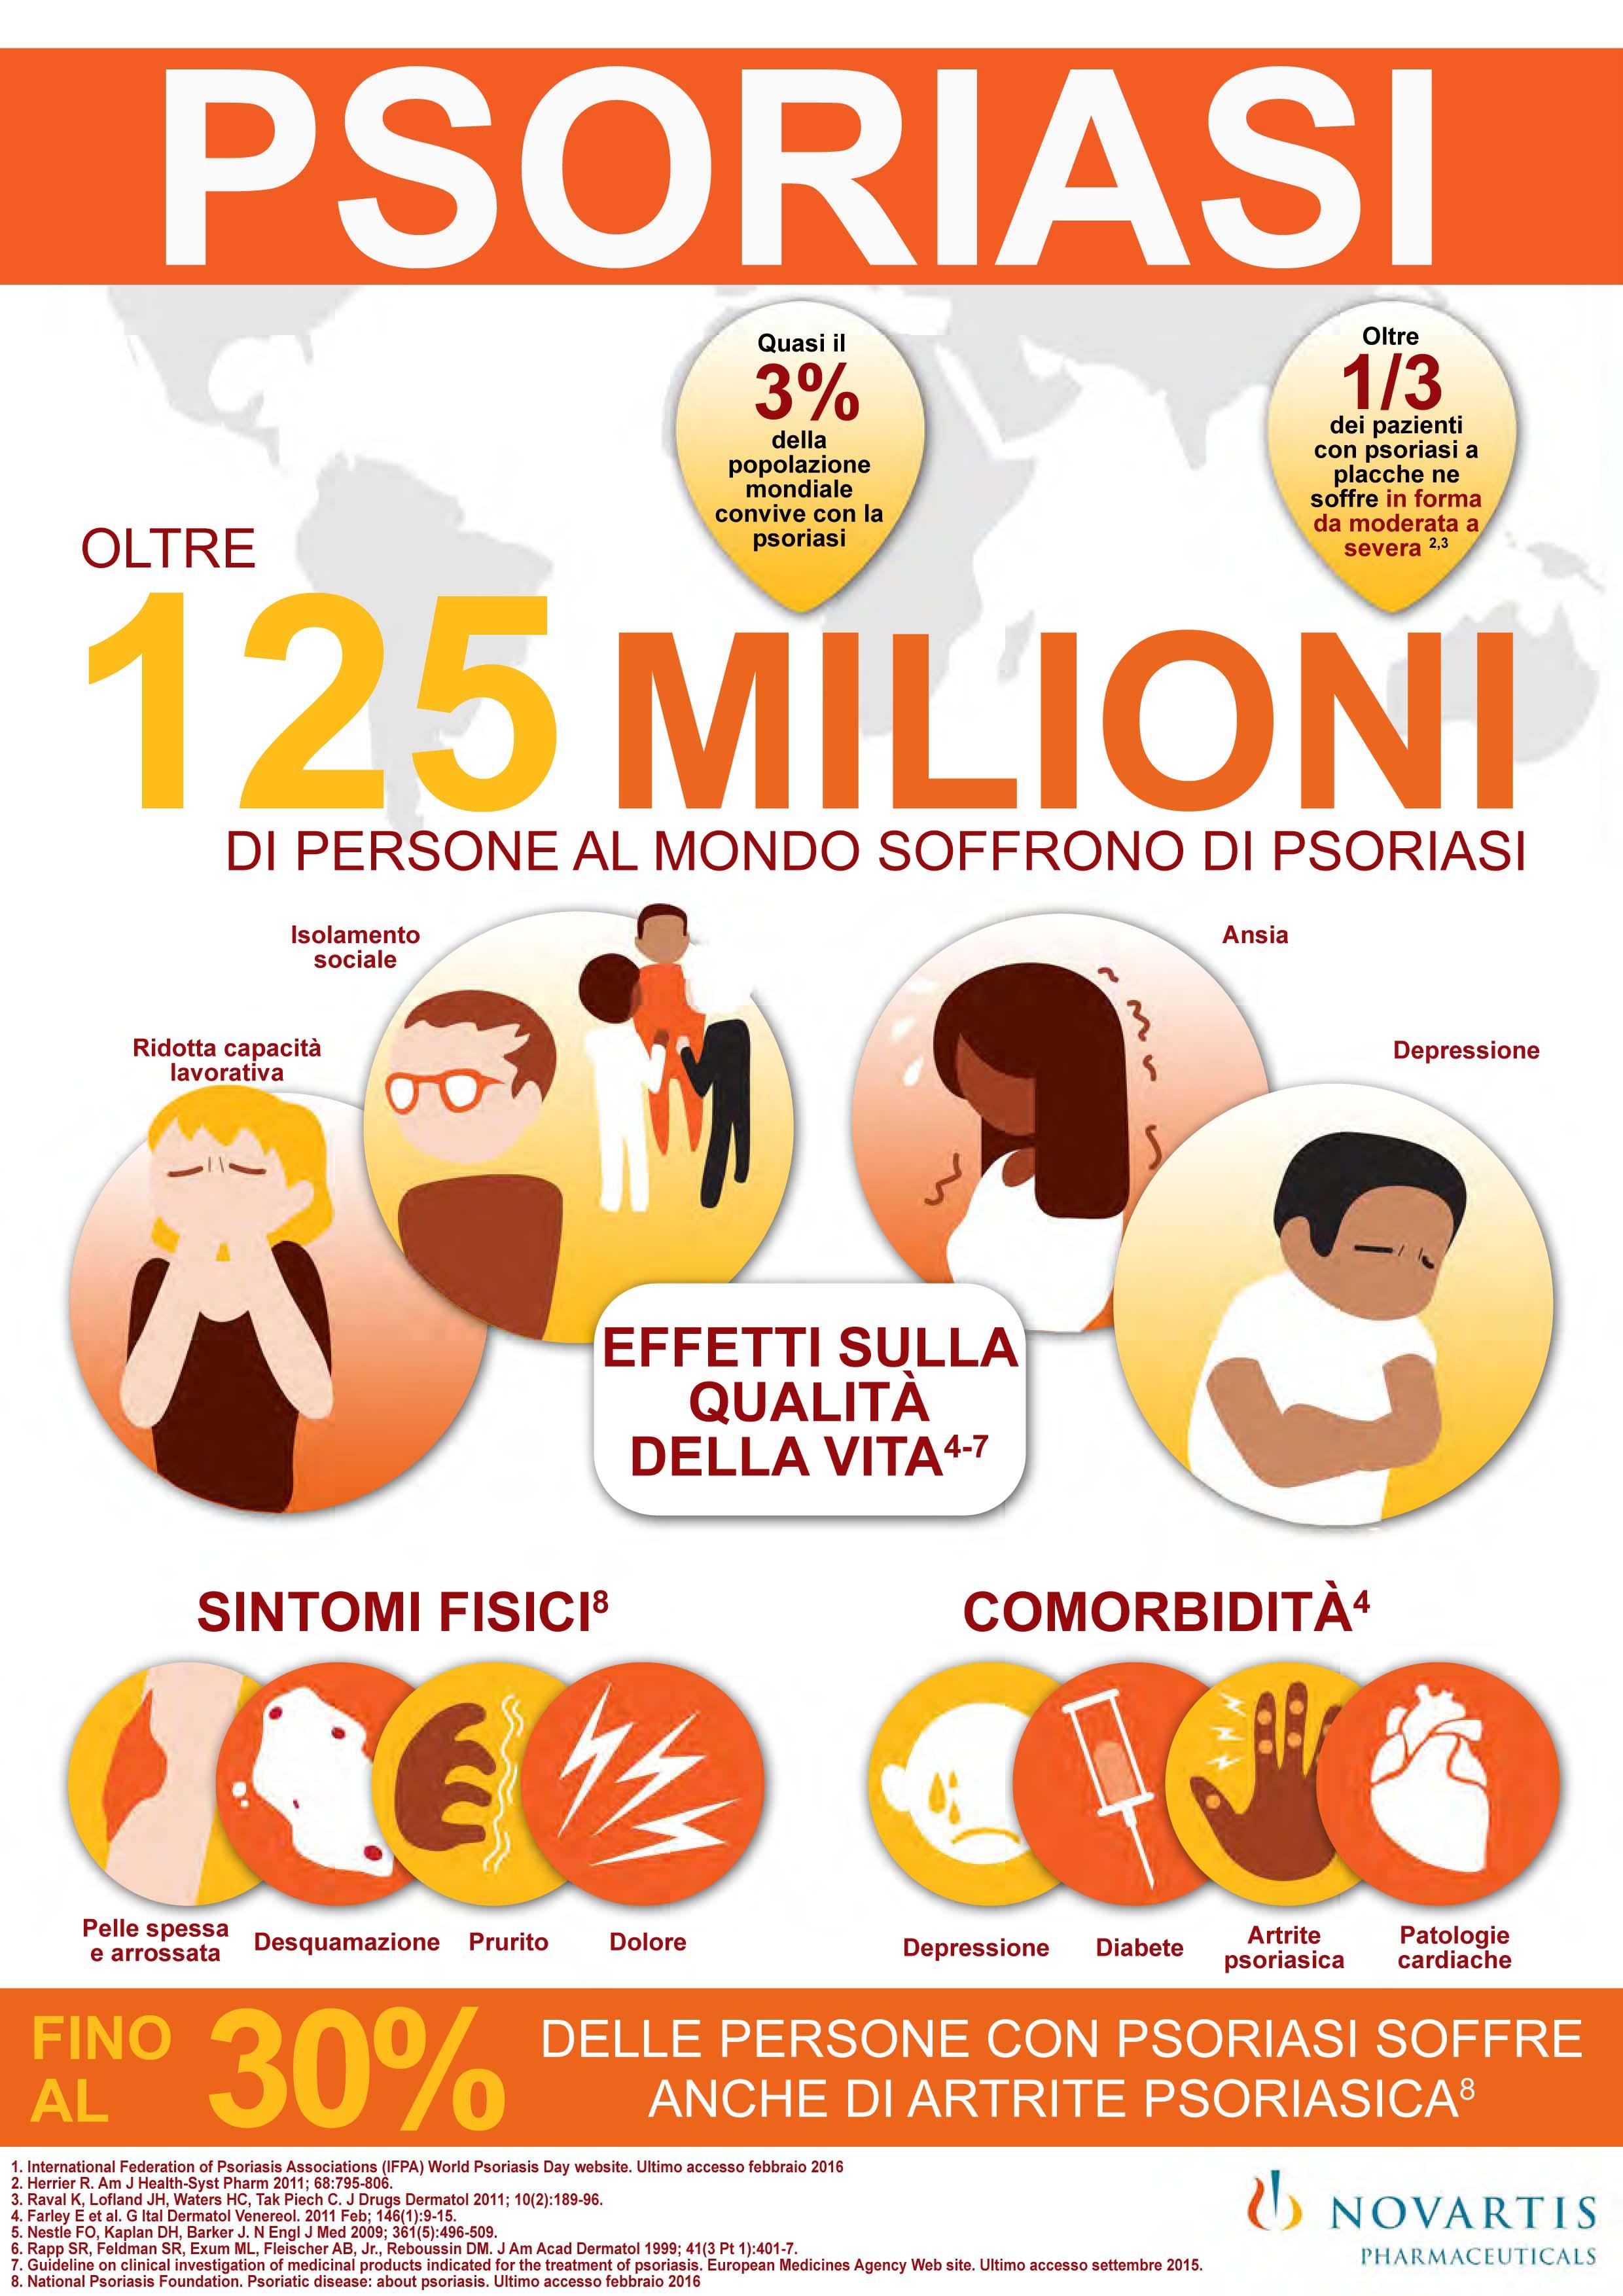 Medicine di antihistaminic di nuova generazione a eczema